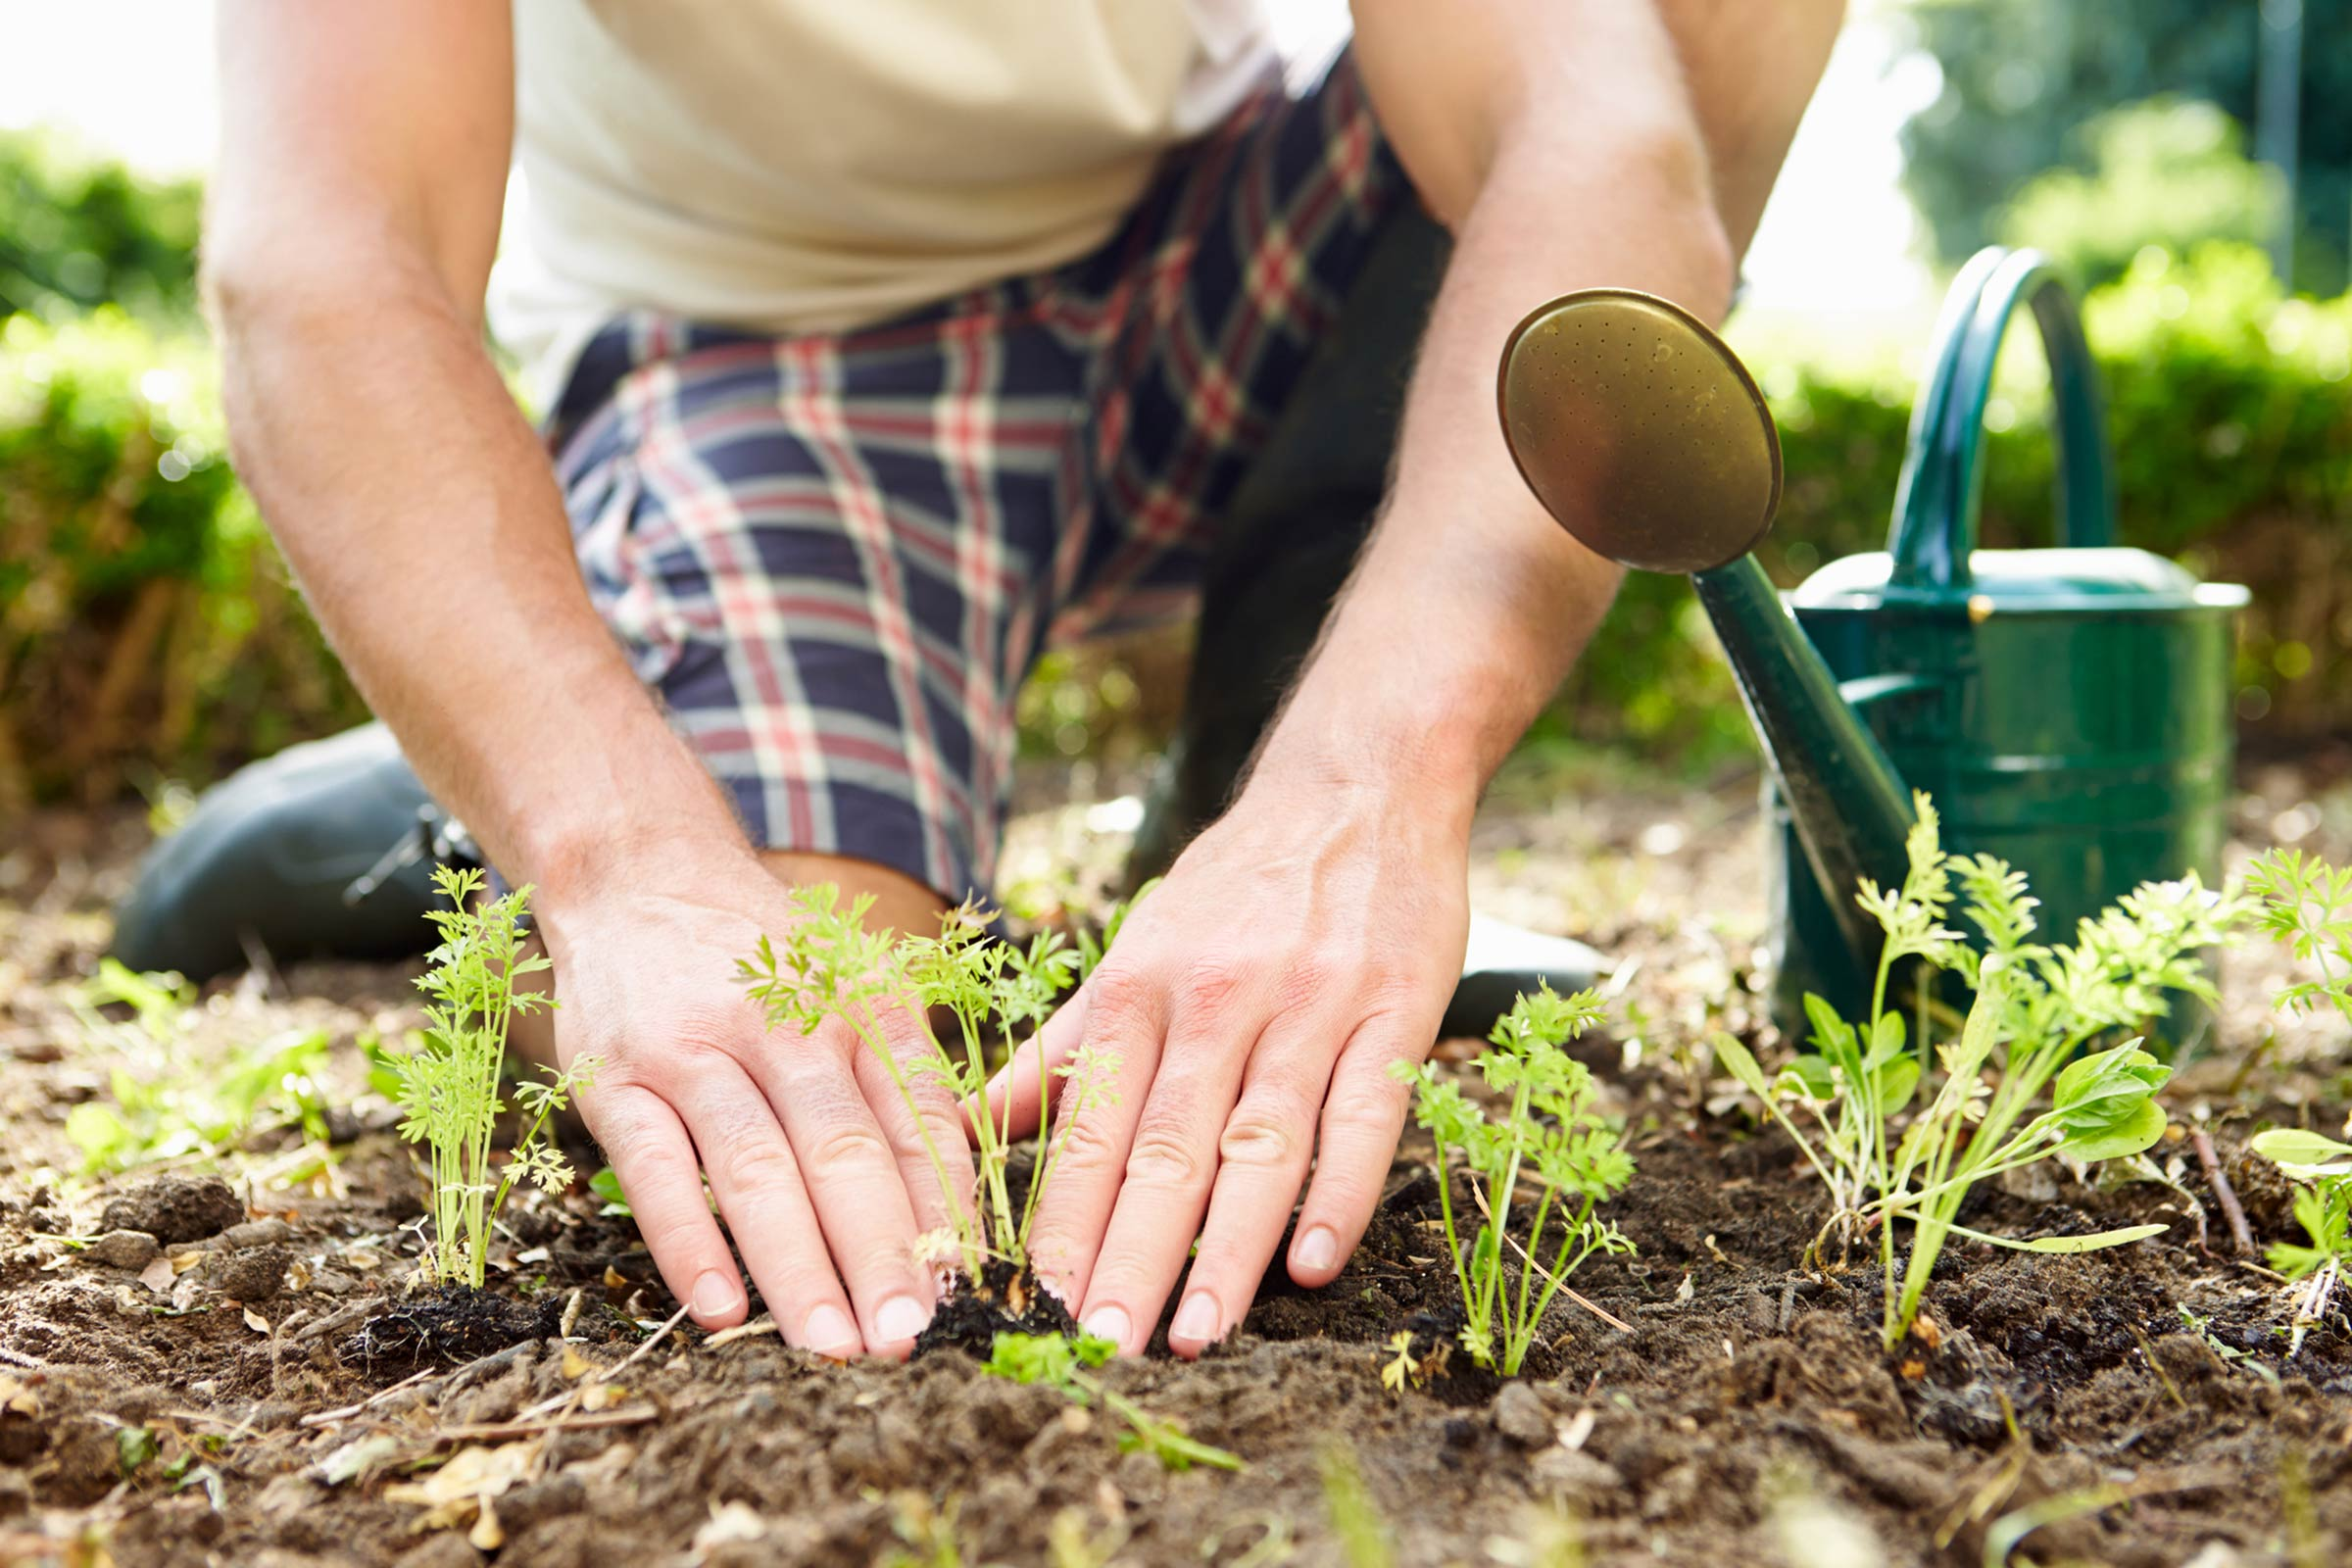 Plant a community garden -